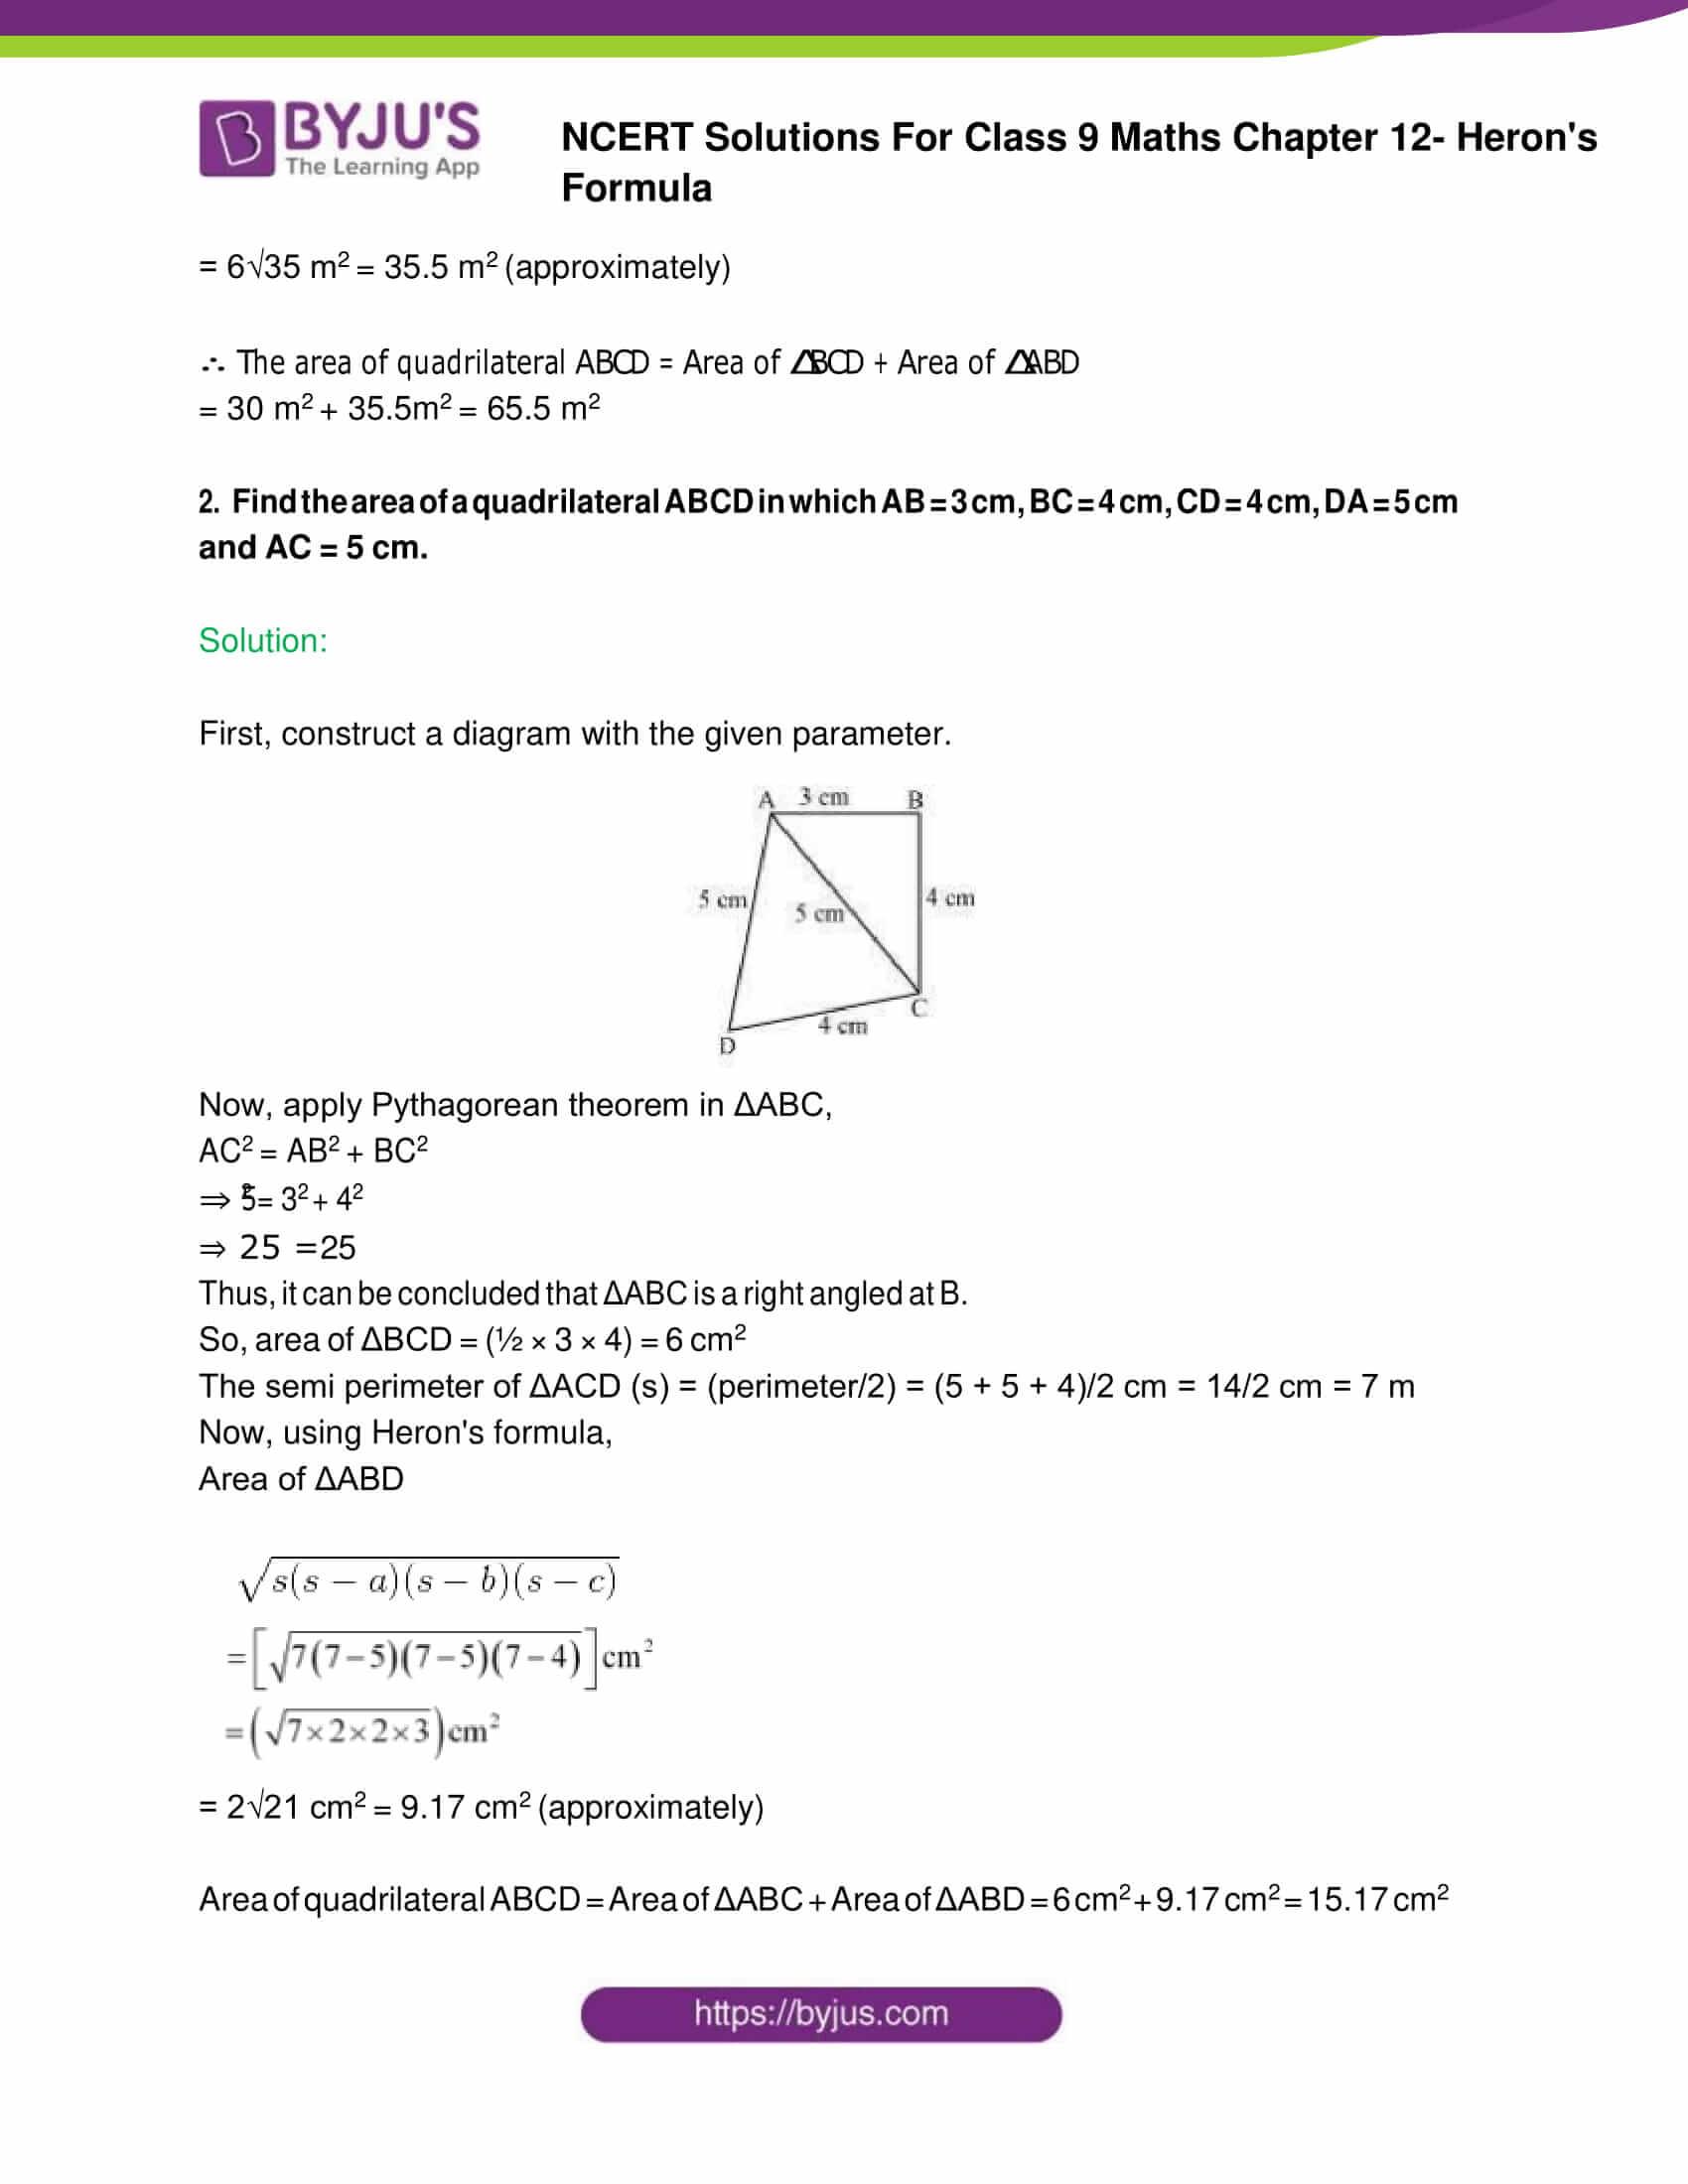 NCERT Solution Class 9 Maths Chapter 12 Herons Formula Exercise 12. 2 Part 2